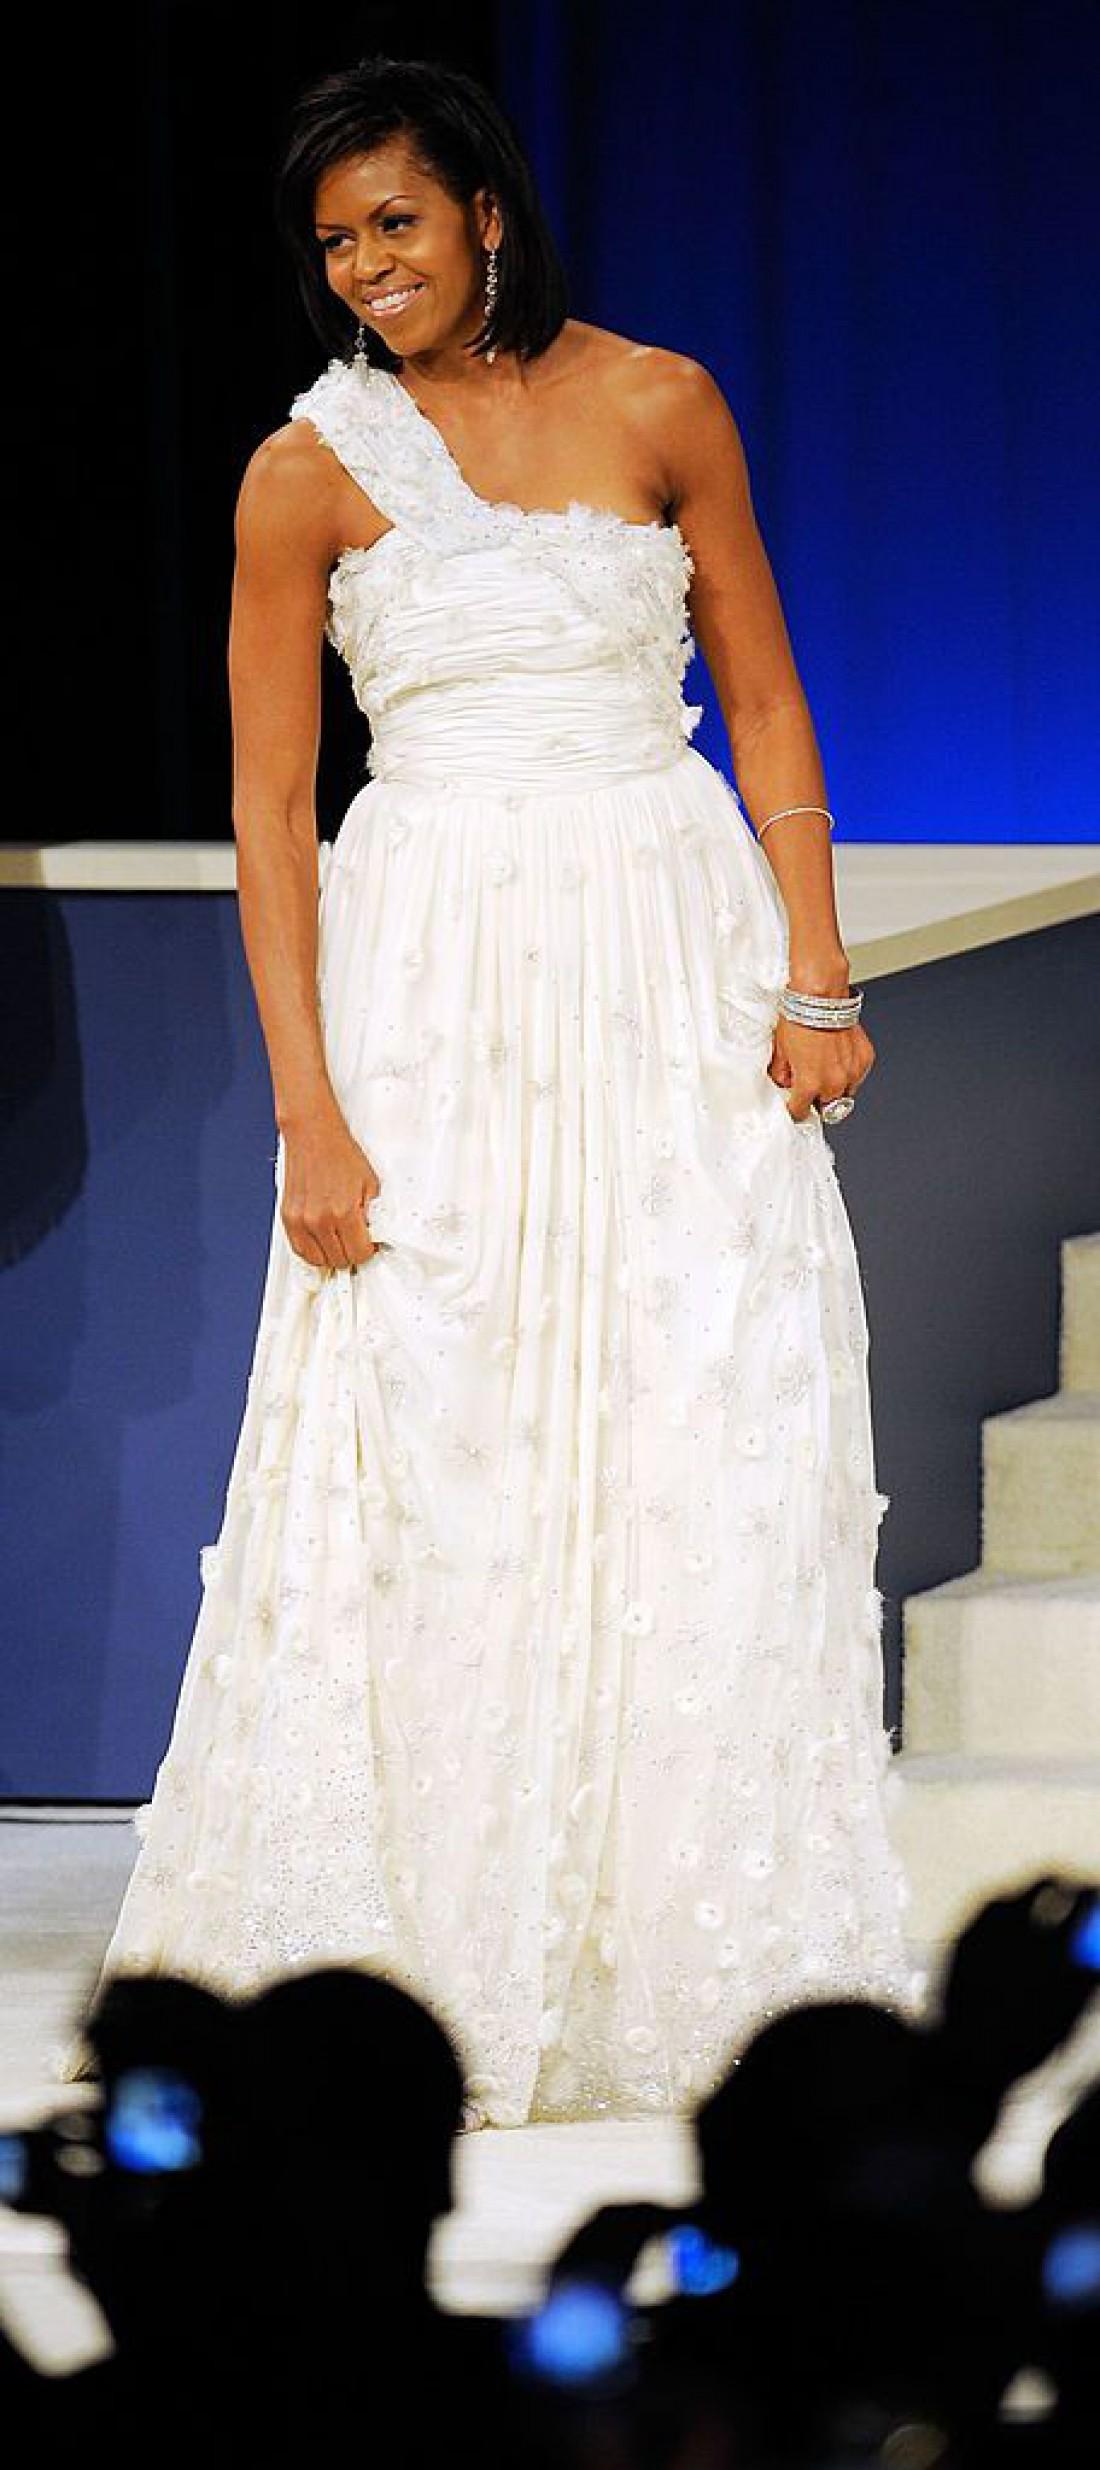 Мишель Обама на инаугурации в наряде от Jason Wu